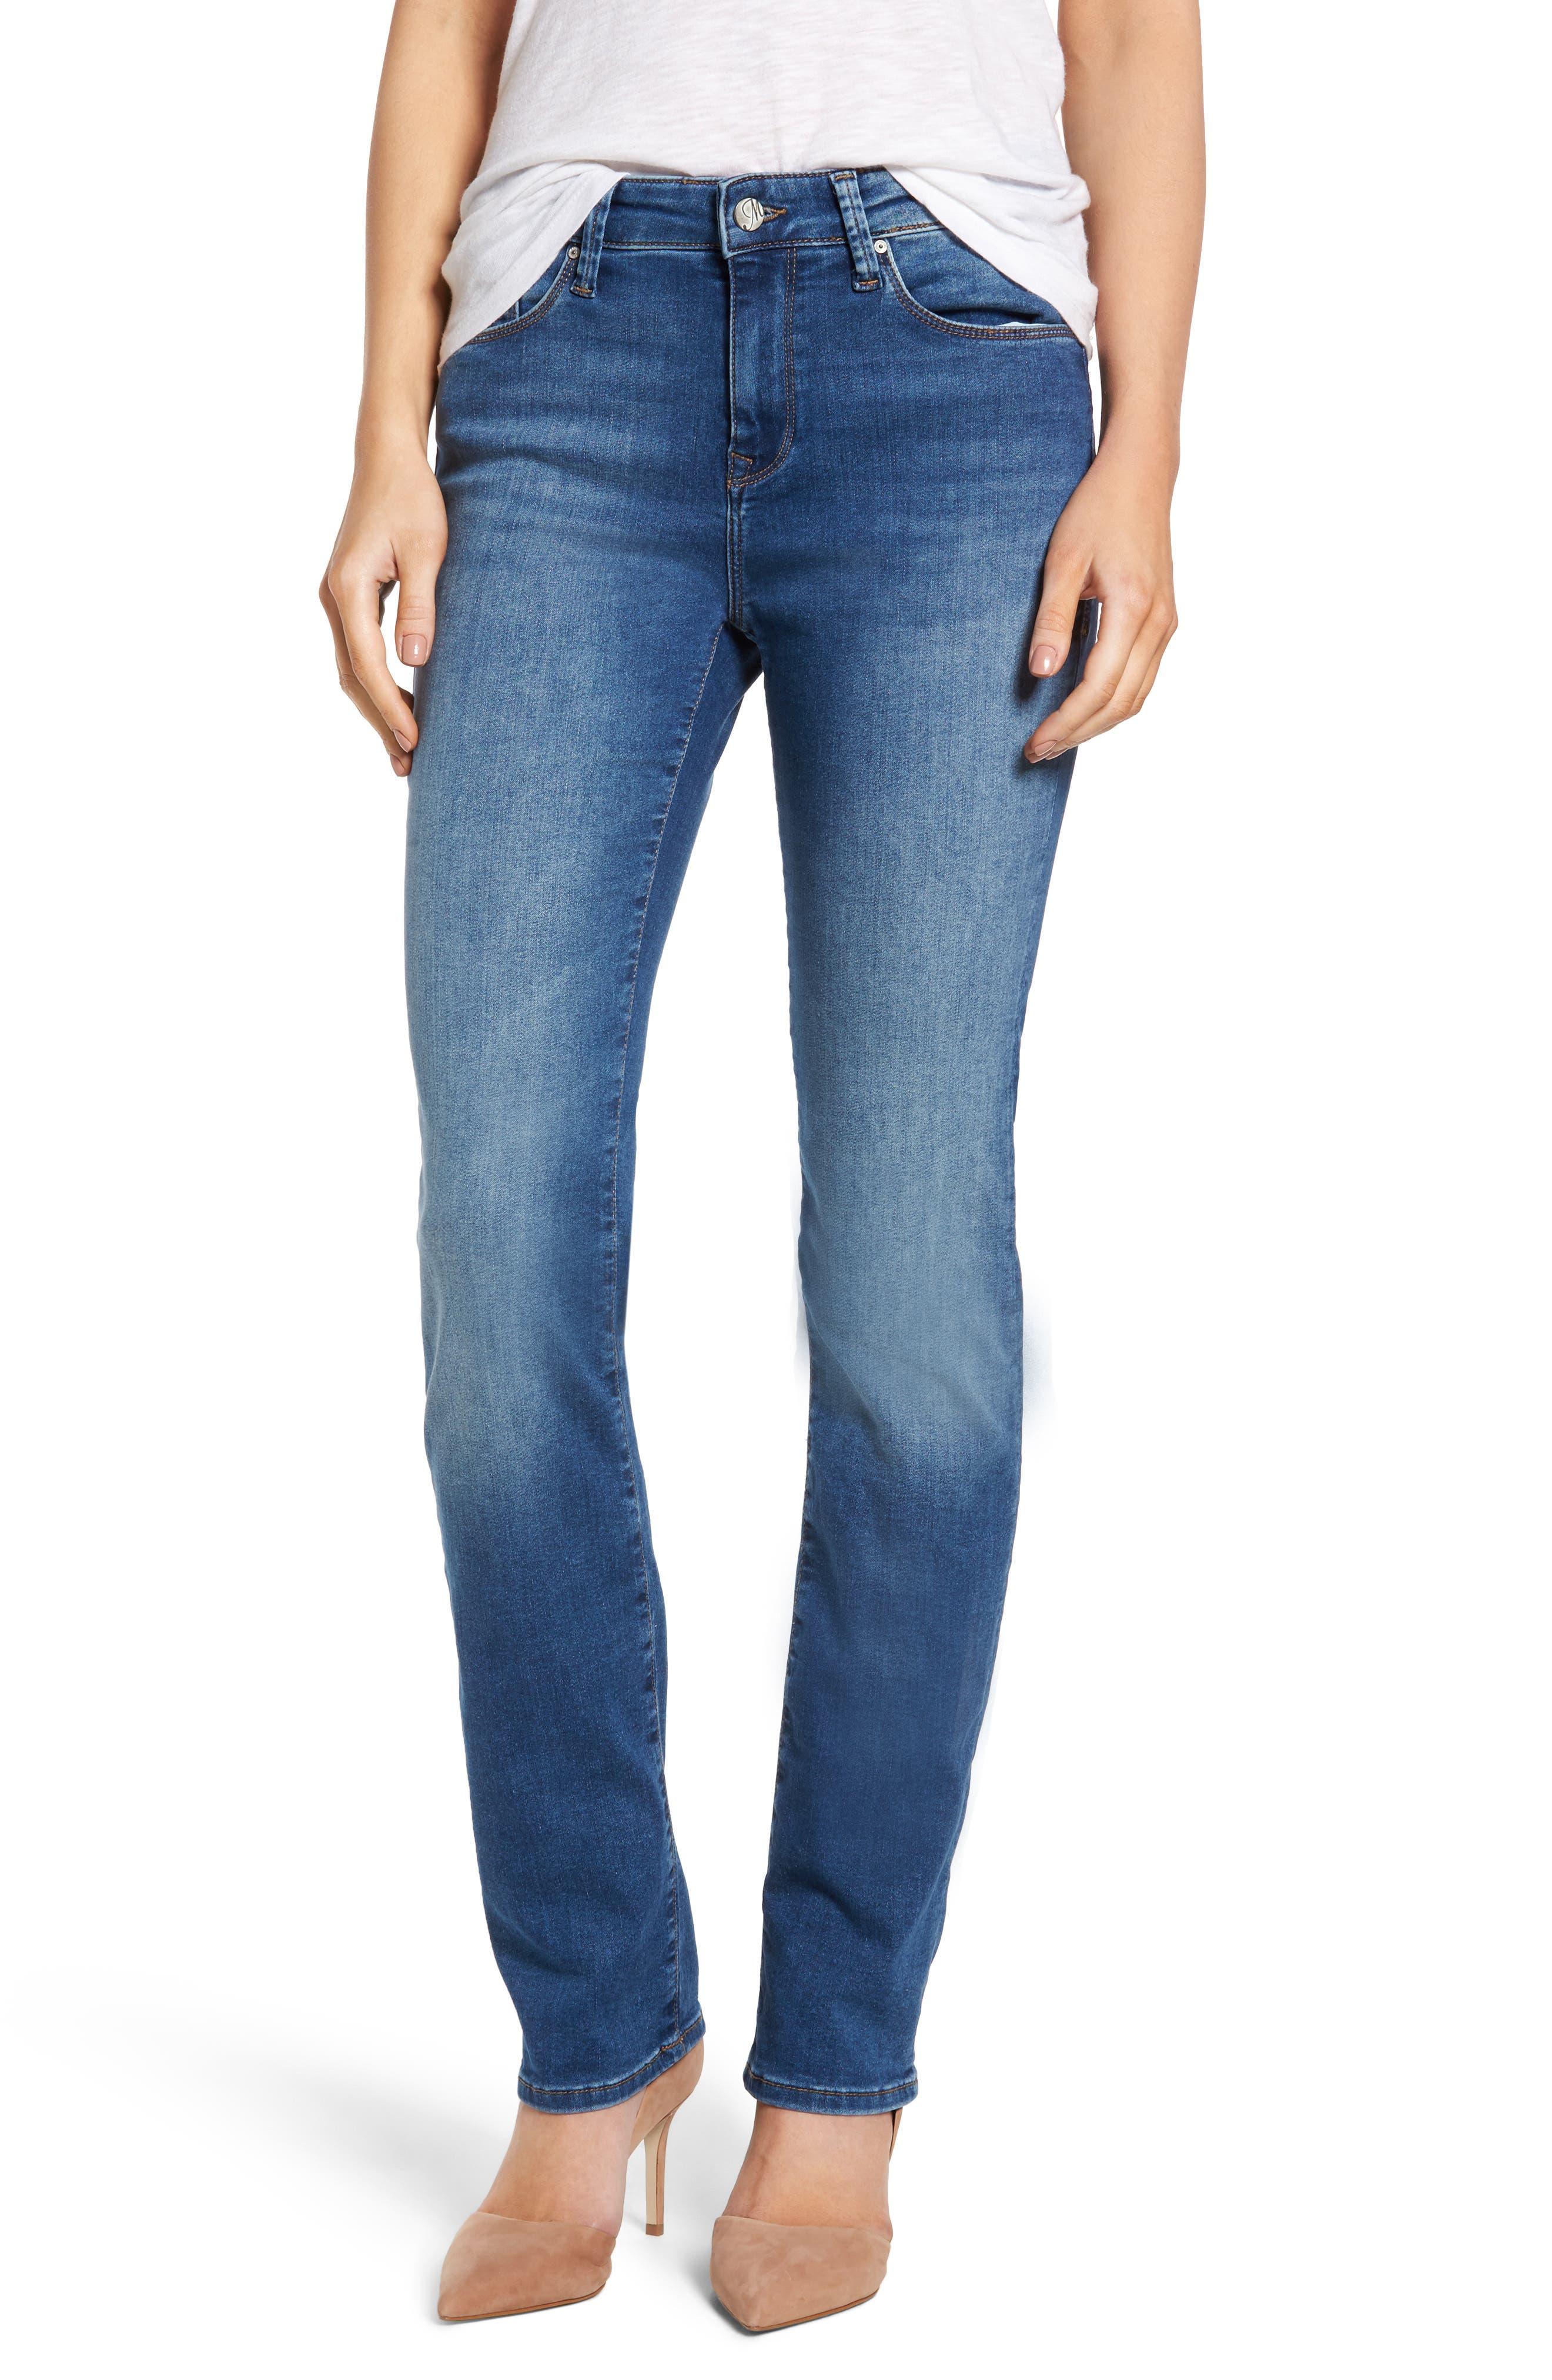 Main Image - Mavi Jeans Kendra High Waist Stretch Denim Jeans (Mid Soft Shanti)